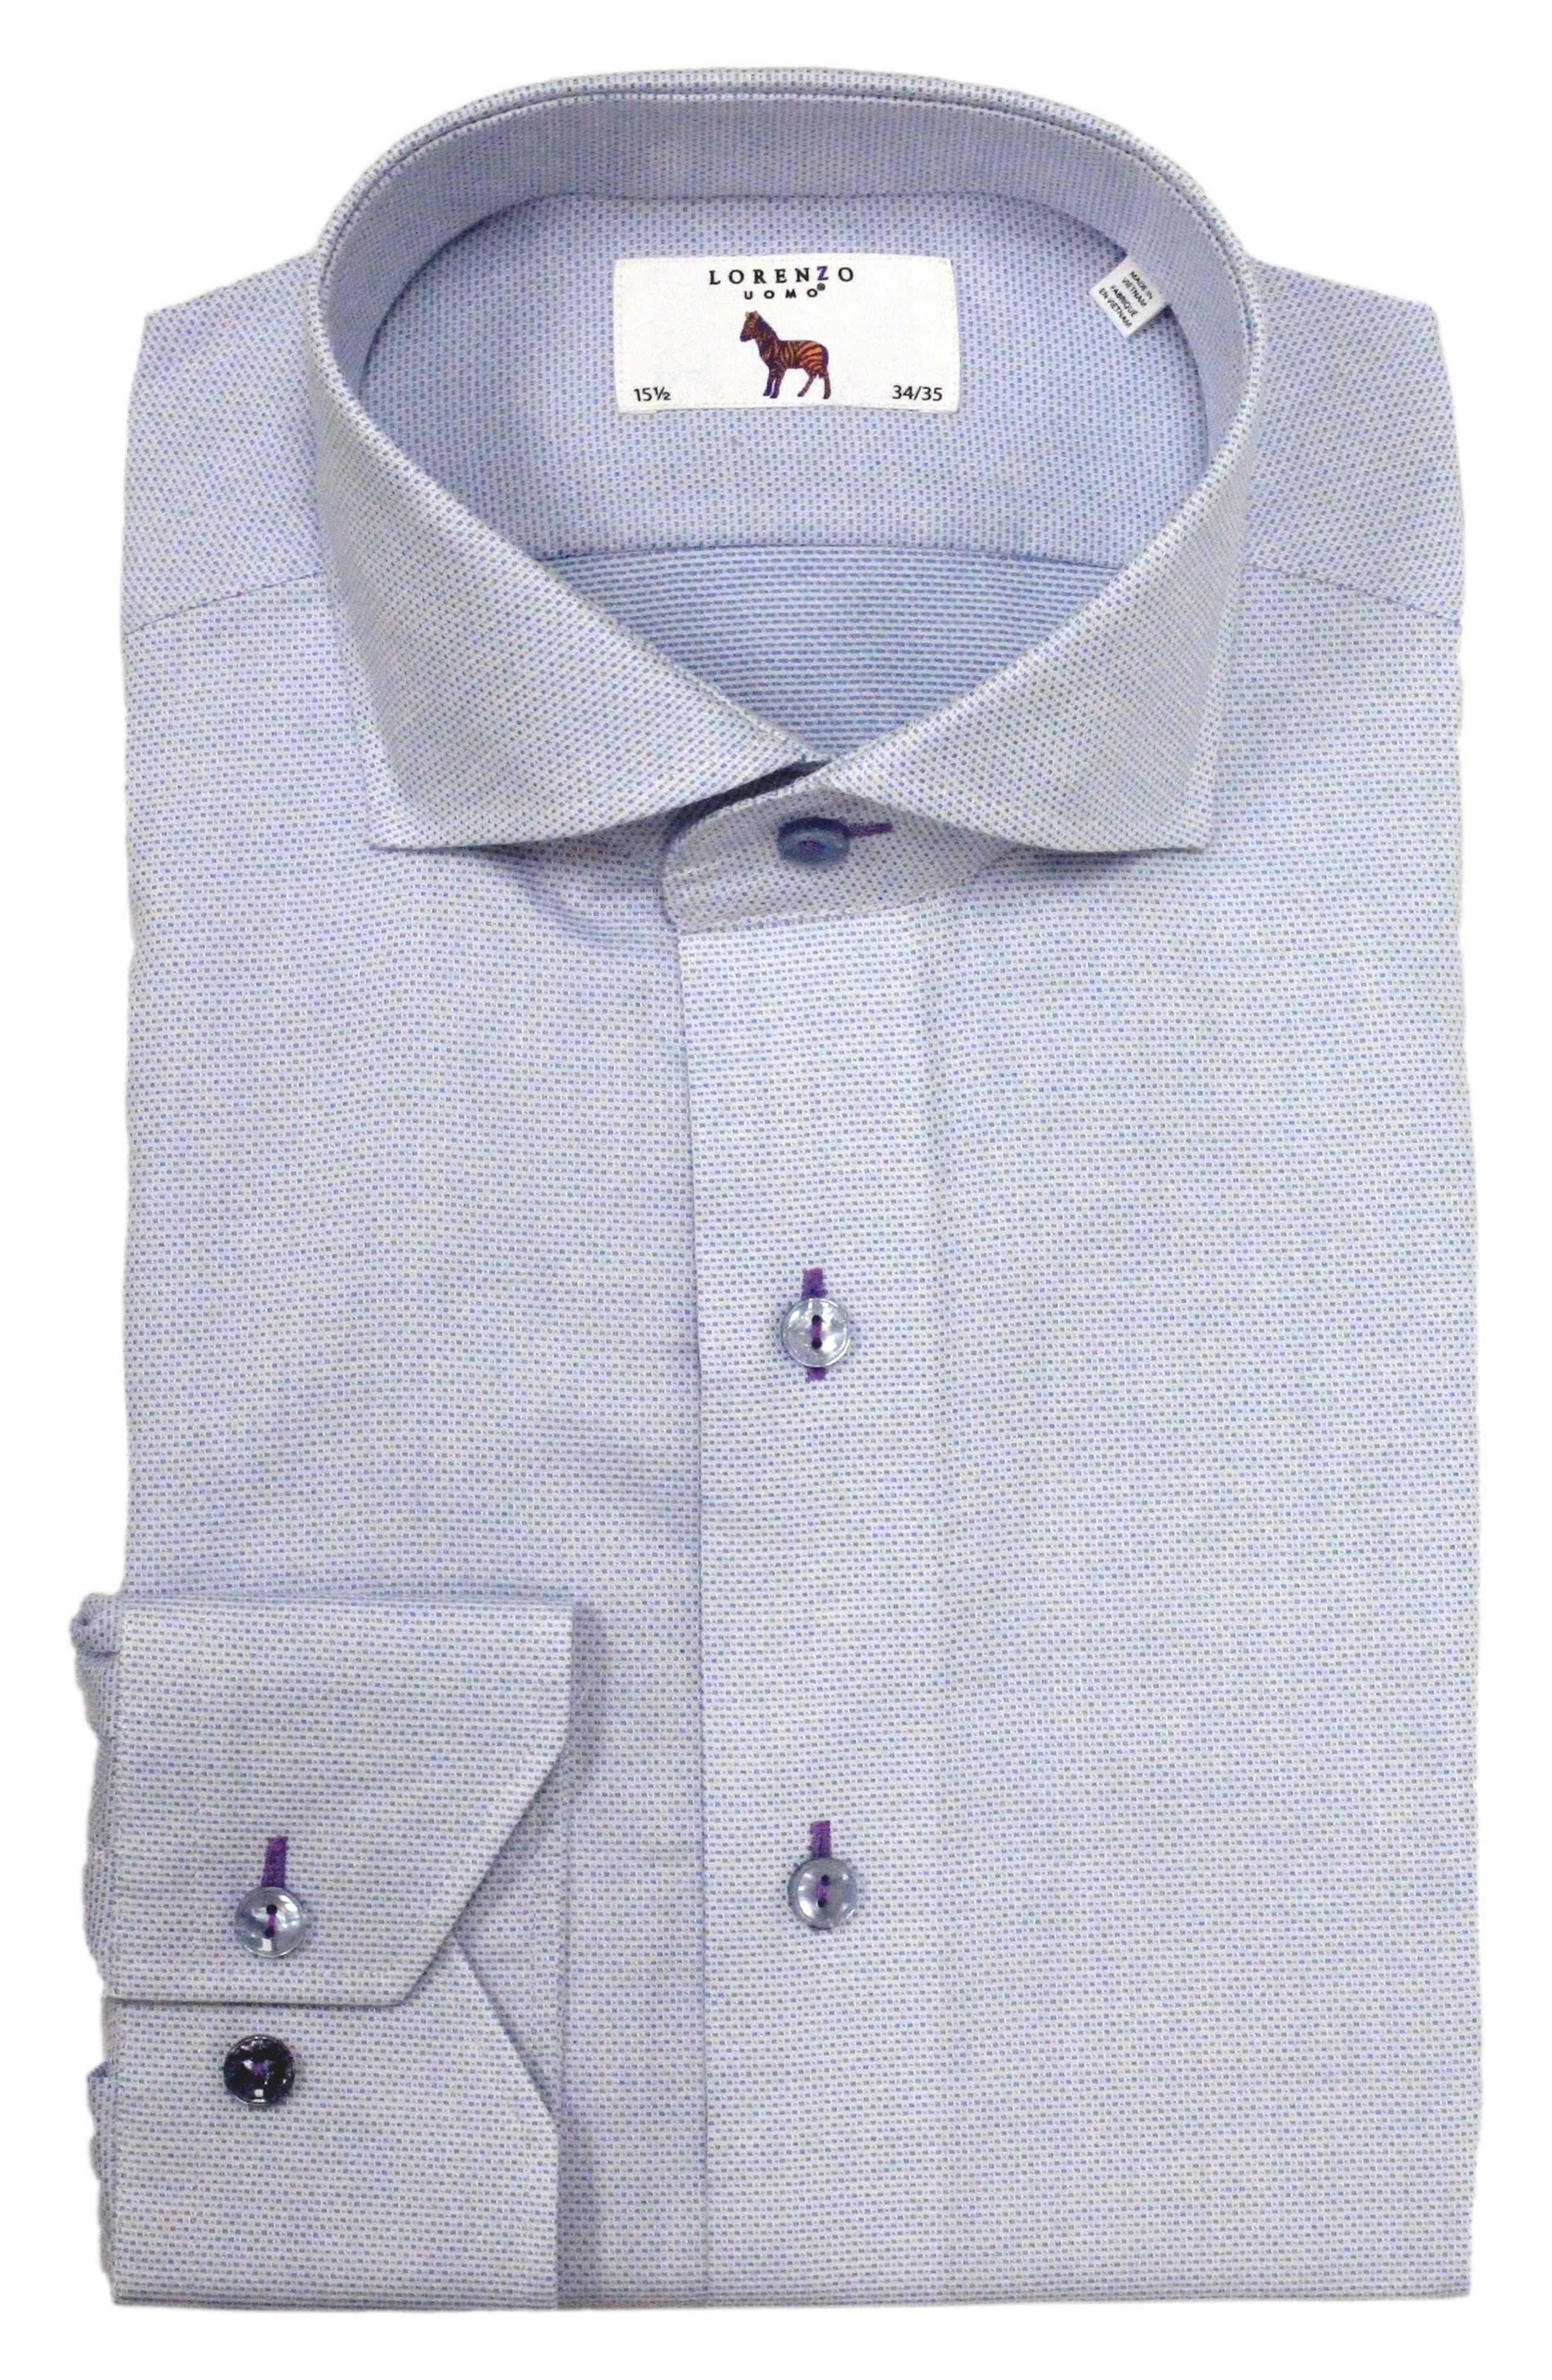 LORENZO UOMO Trim Fit Solid Dress Shirt, Main, color, LIGHT BLUE